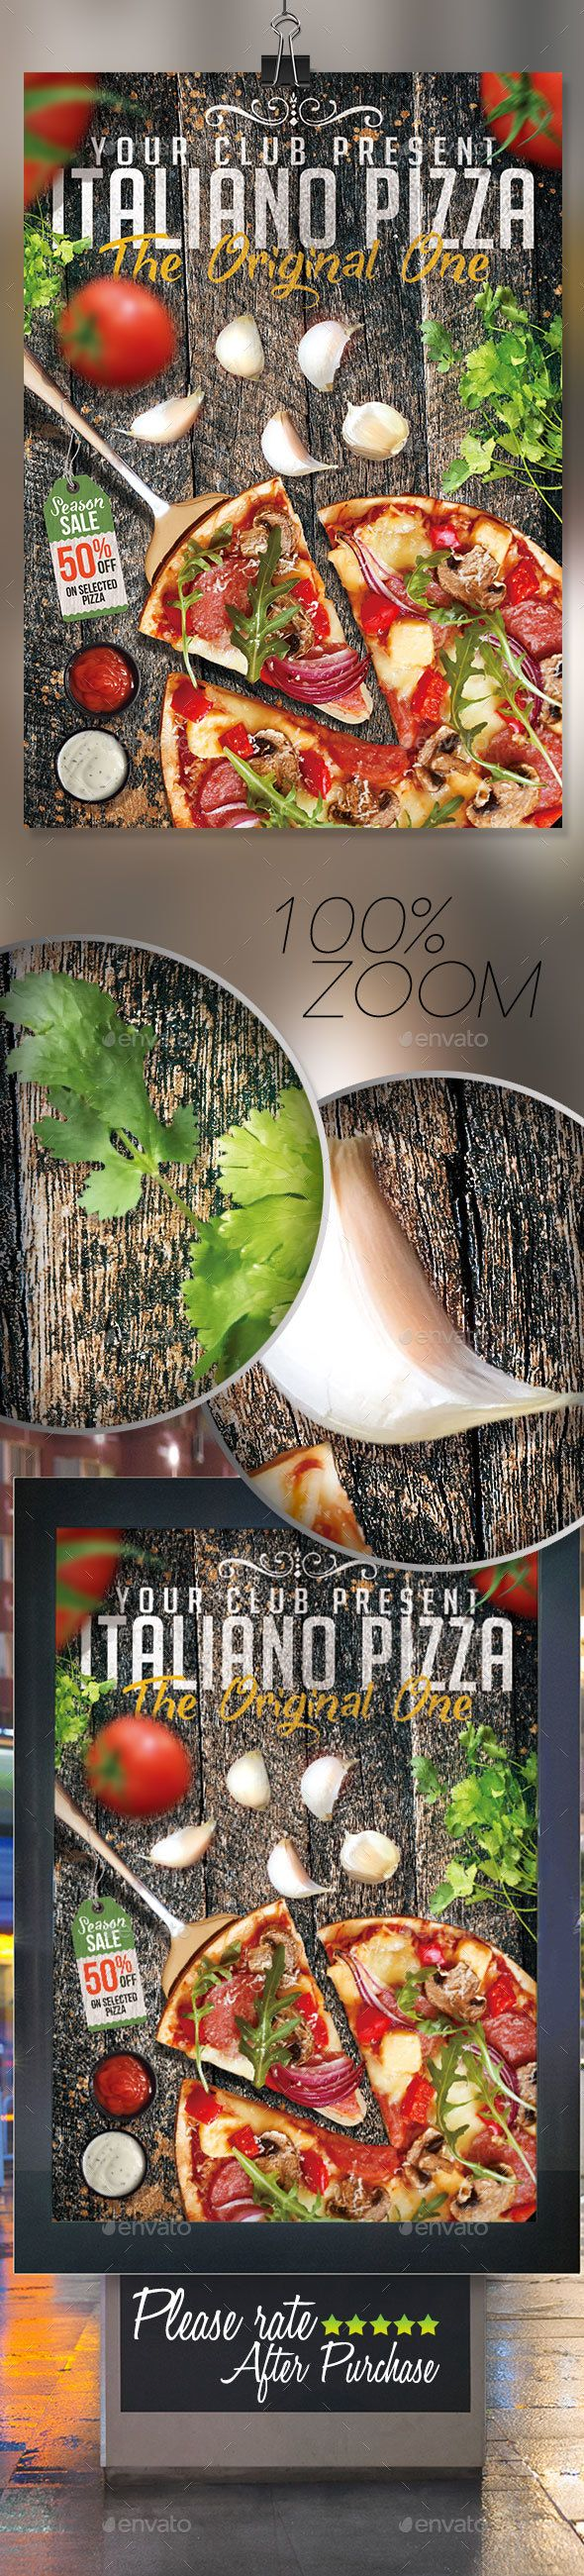 Italian #pizza vol2 flyer template  - #Restaurant #Flyers Download here: https://graphicriver.net/item/italian-pizza-vol2-flyer-template-/16724926?ref=alena994